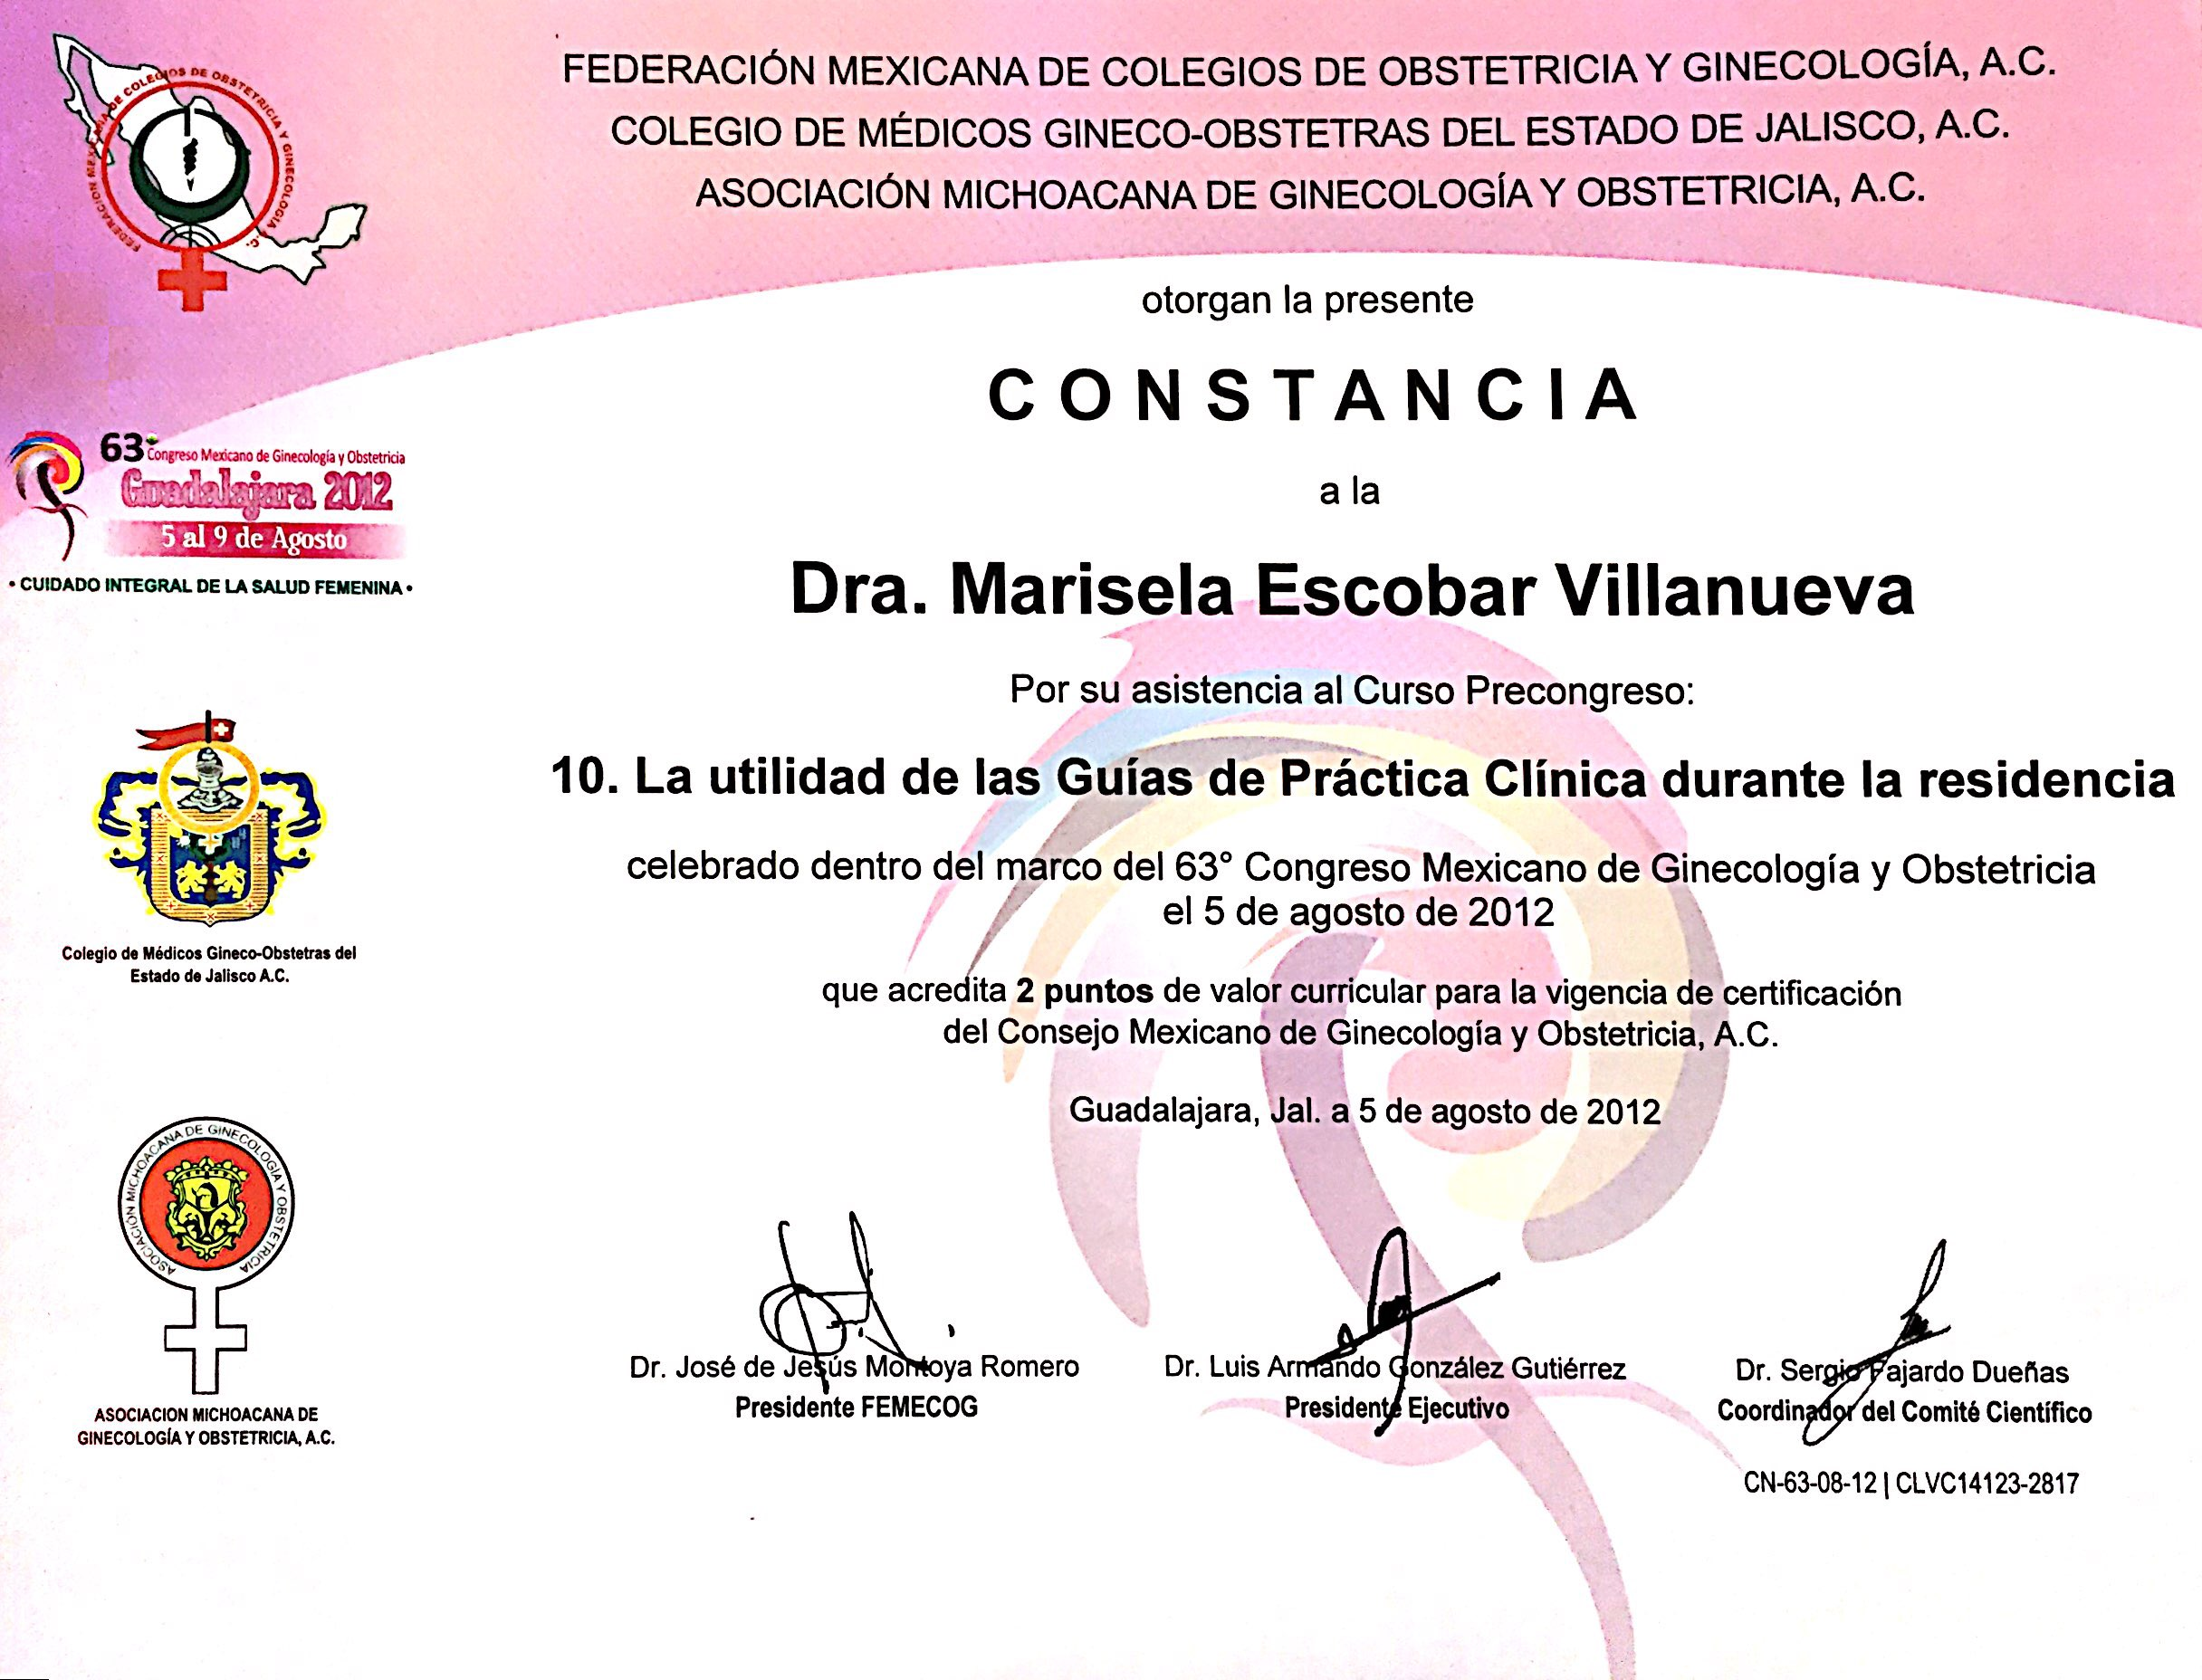 Nuevo doc 2018-02-20 11.21.39_12